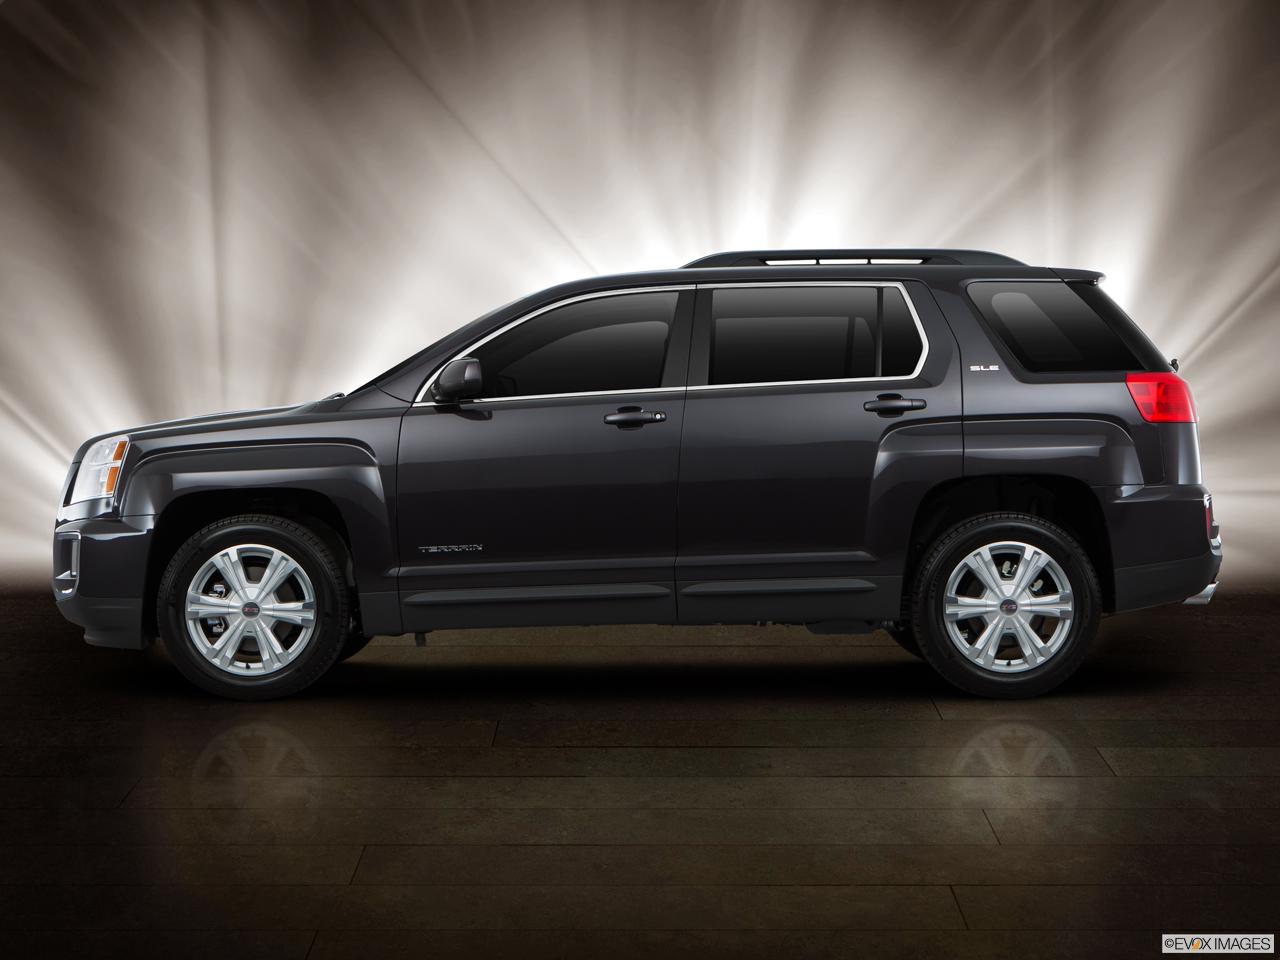 Car Dealerships Decatur Il >> 2016 GMC Terrain | Jackson GMC serving Decatur Tuscola and Mattoon